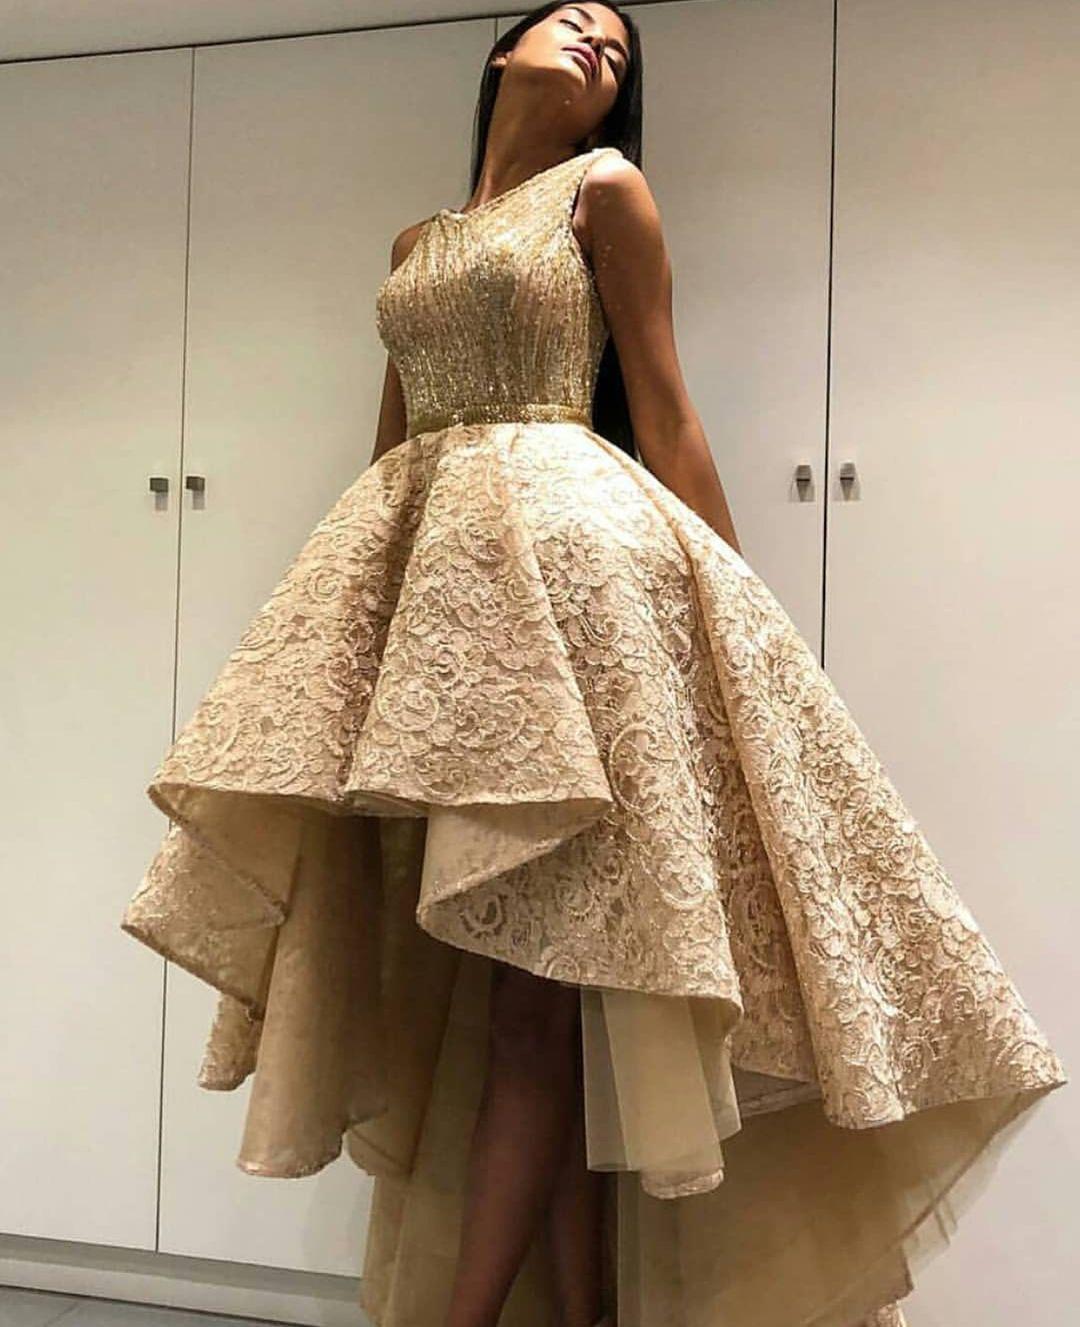 Habit De Reve Gold Dress Short Prom Dresses For Teens Soiree Dress [ 1327 x 1080 Pixel ]